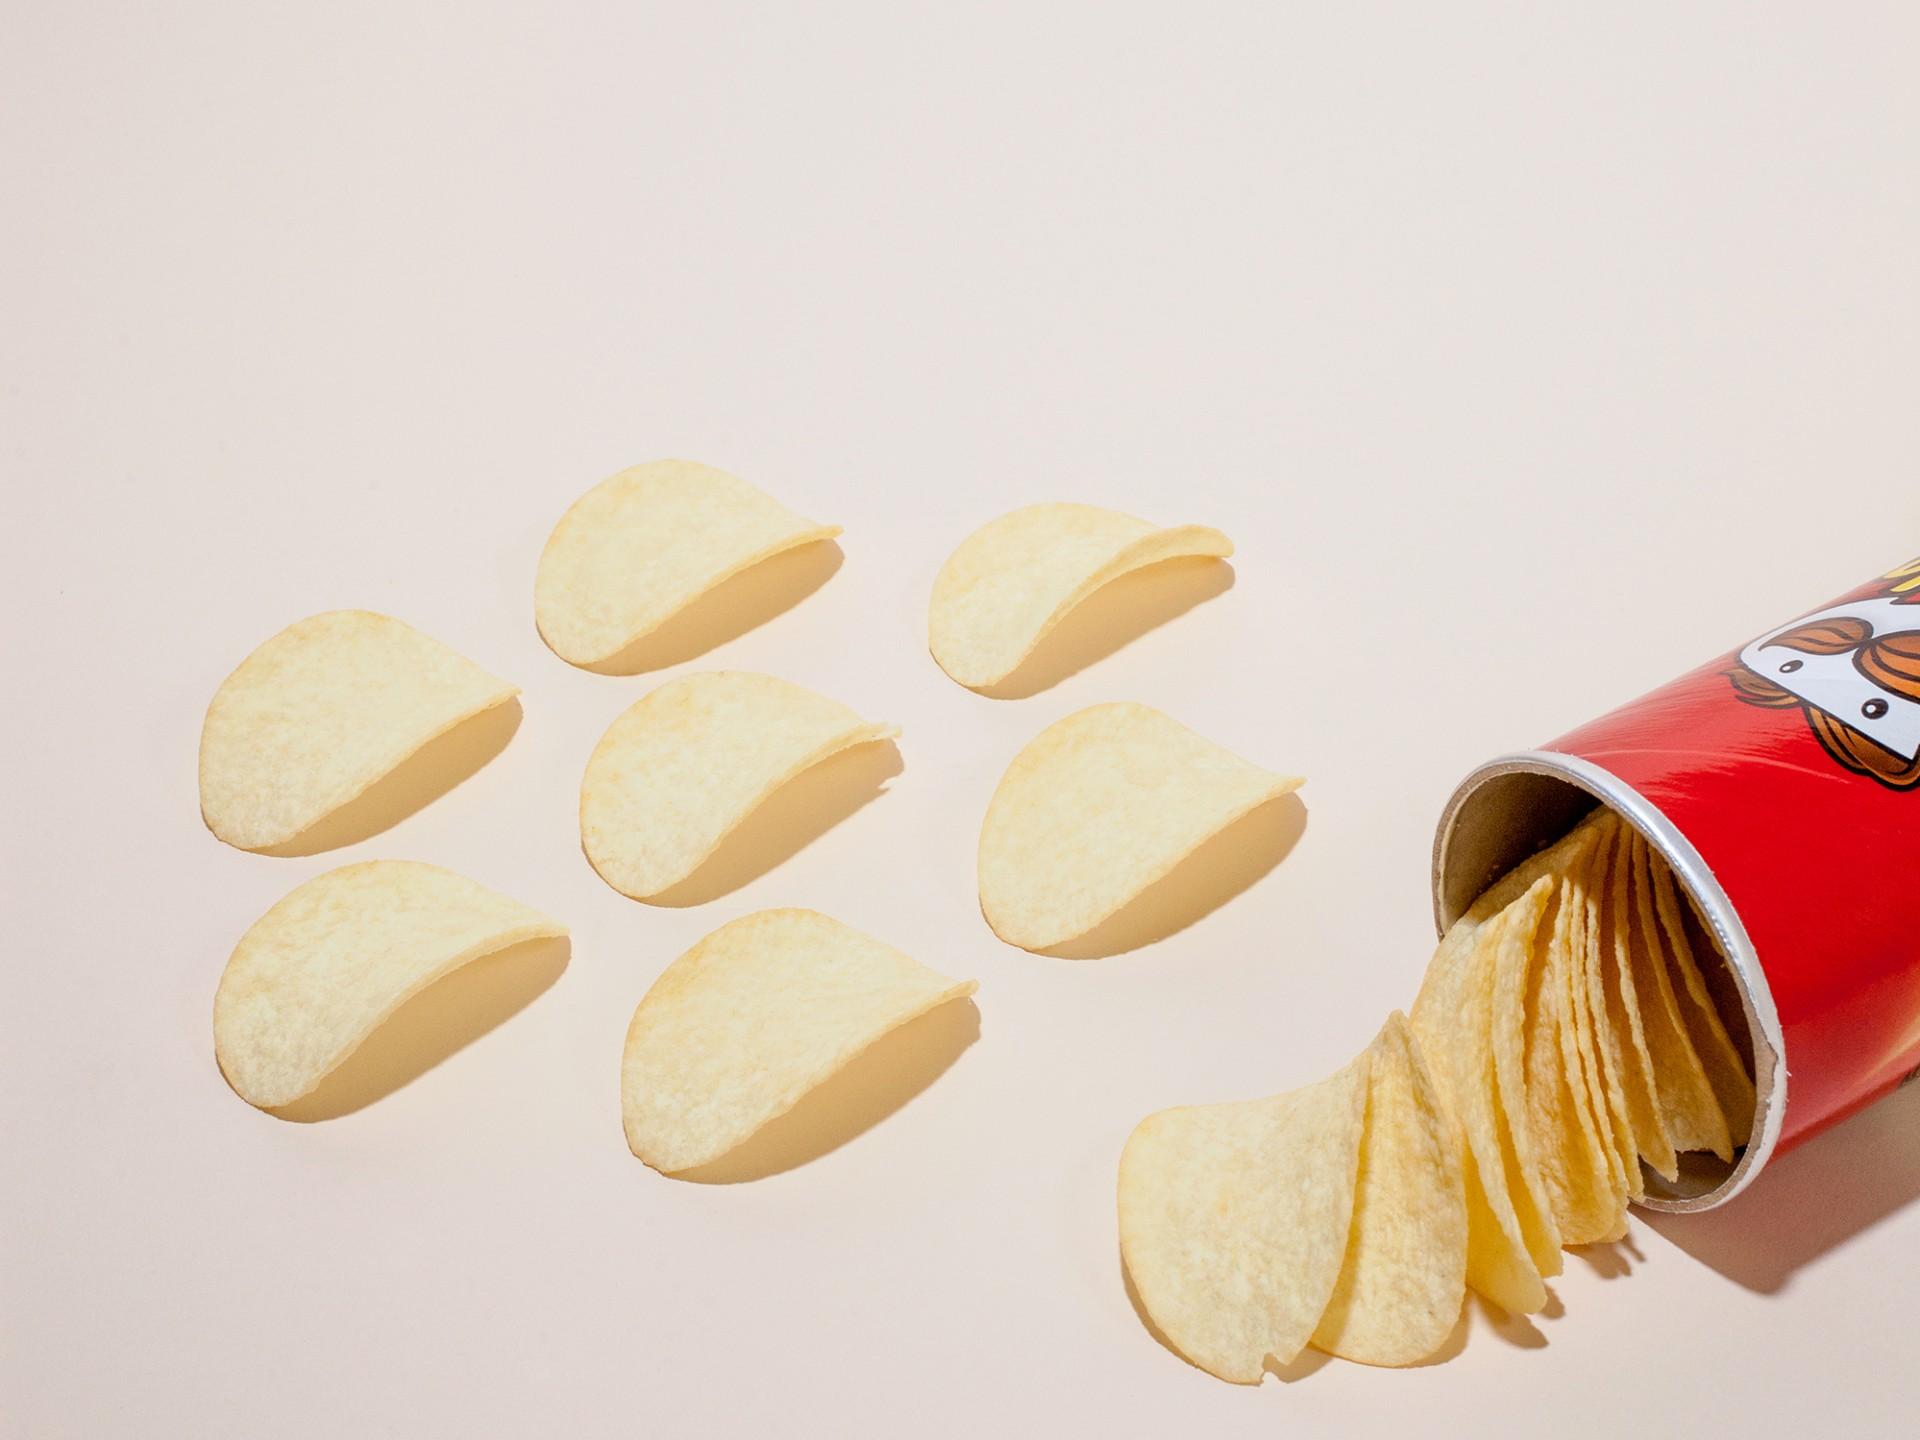 Pringles. Image: Ariel Zambelich/NPR